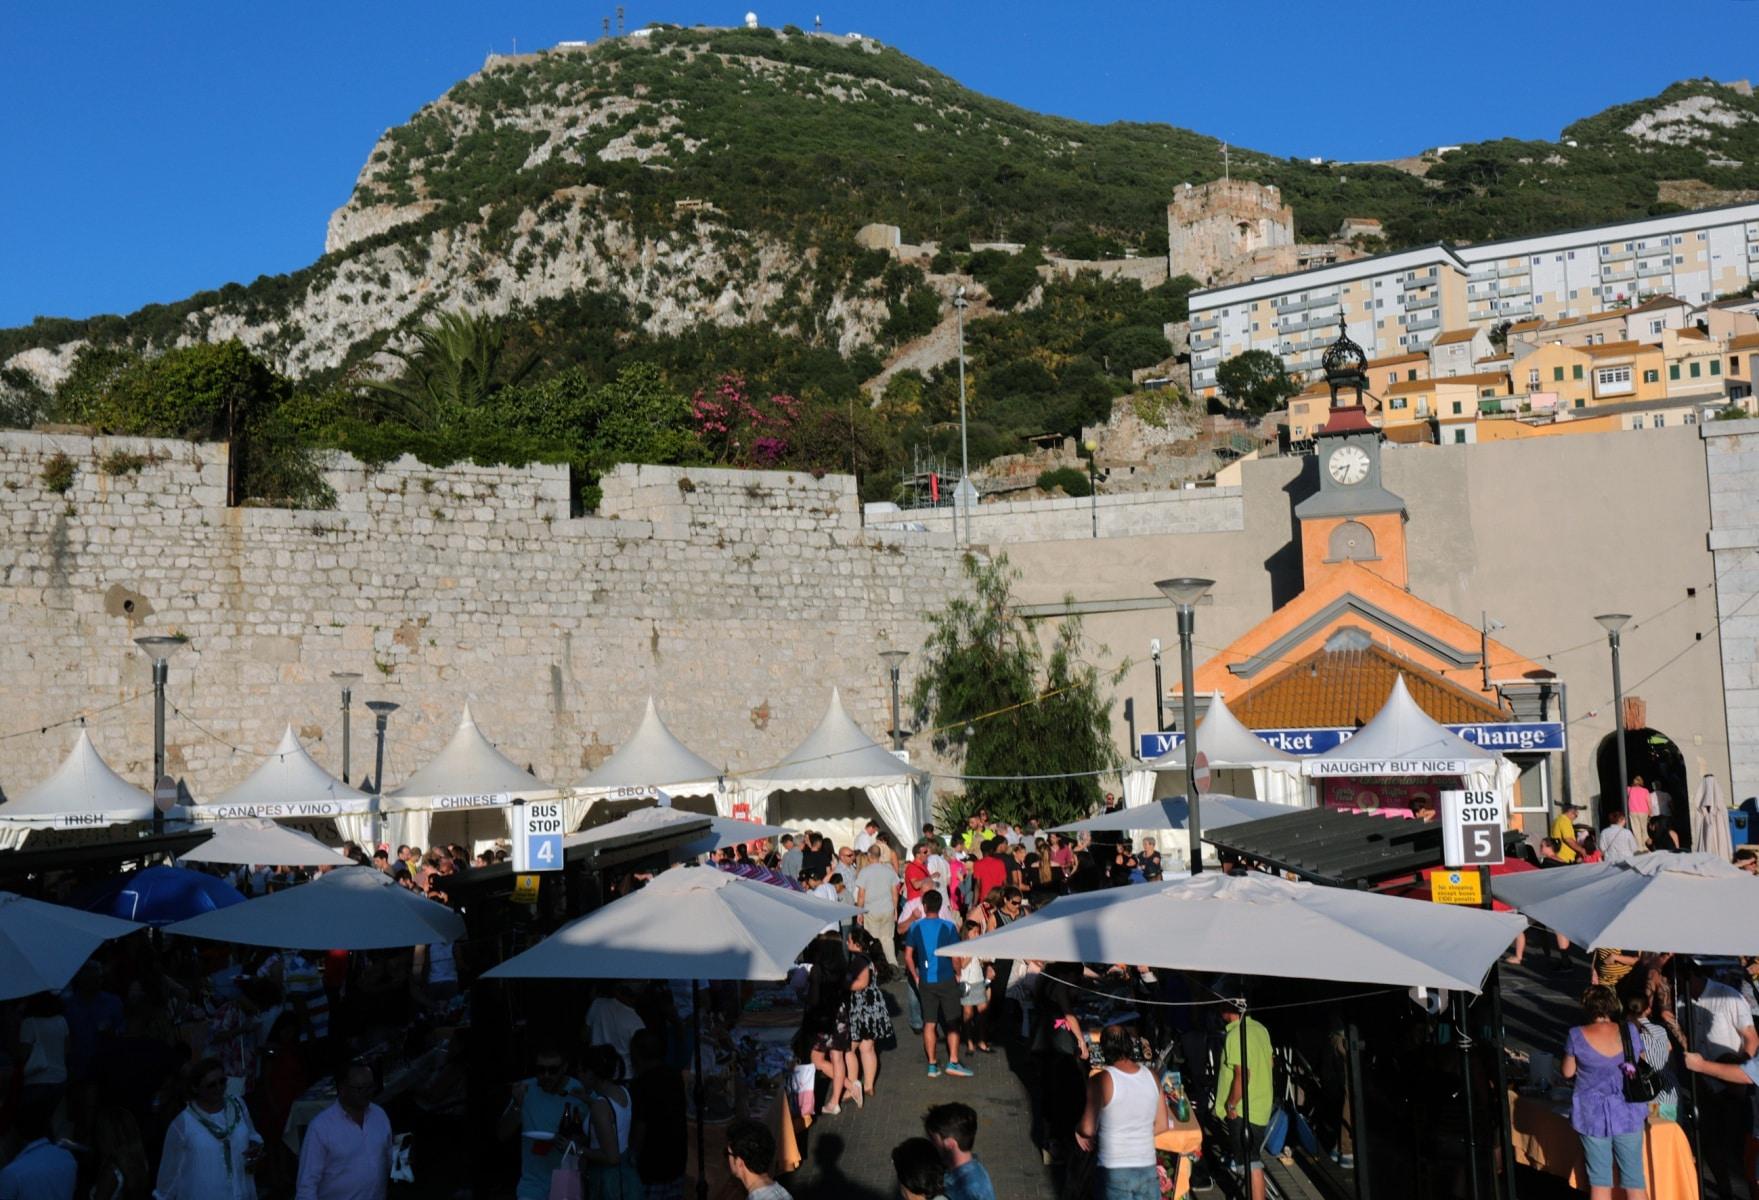 18-jun-2016-noche-de-la-calentita-en-gibraltar_27732674102_o